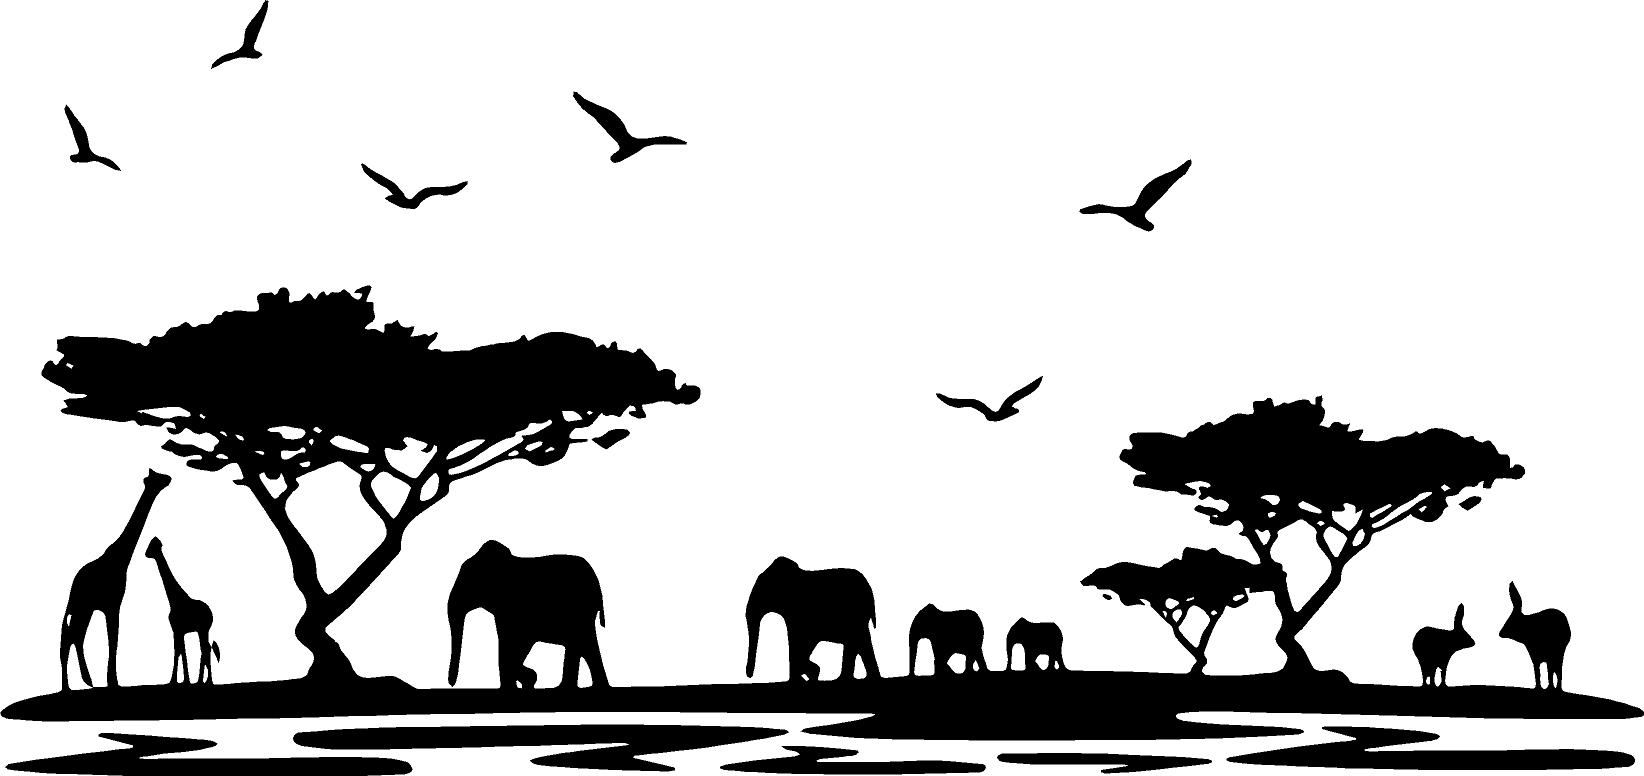 Africa Wildlife Silhouette of Giraffes Elephant Birds on Glossy Poster Print